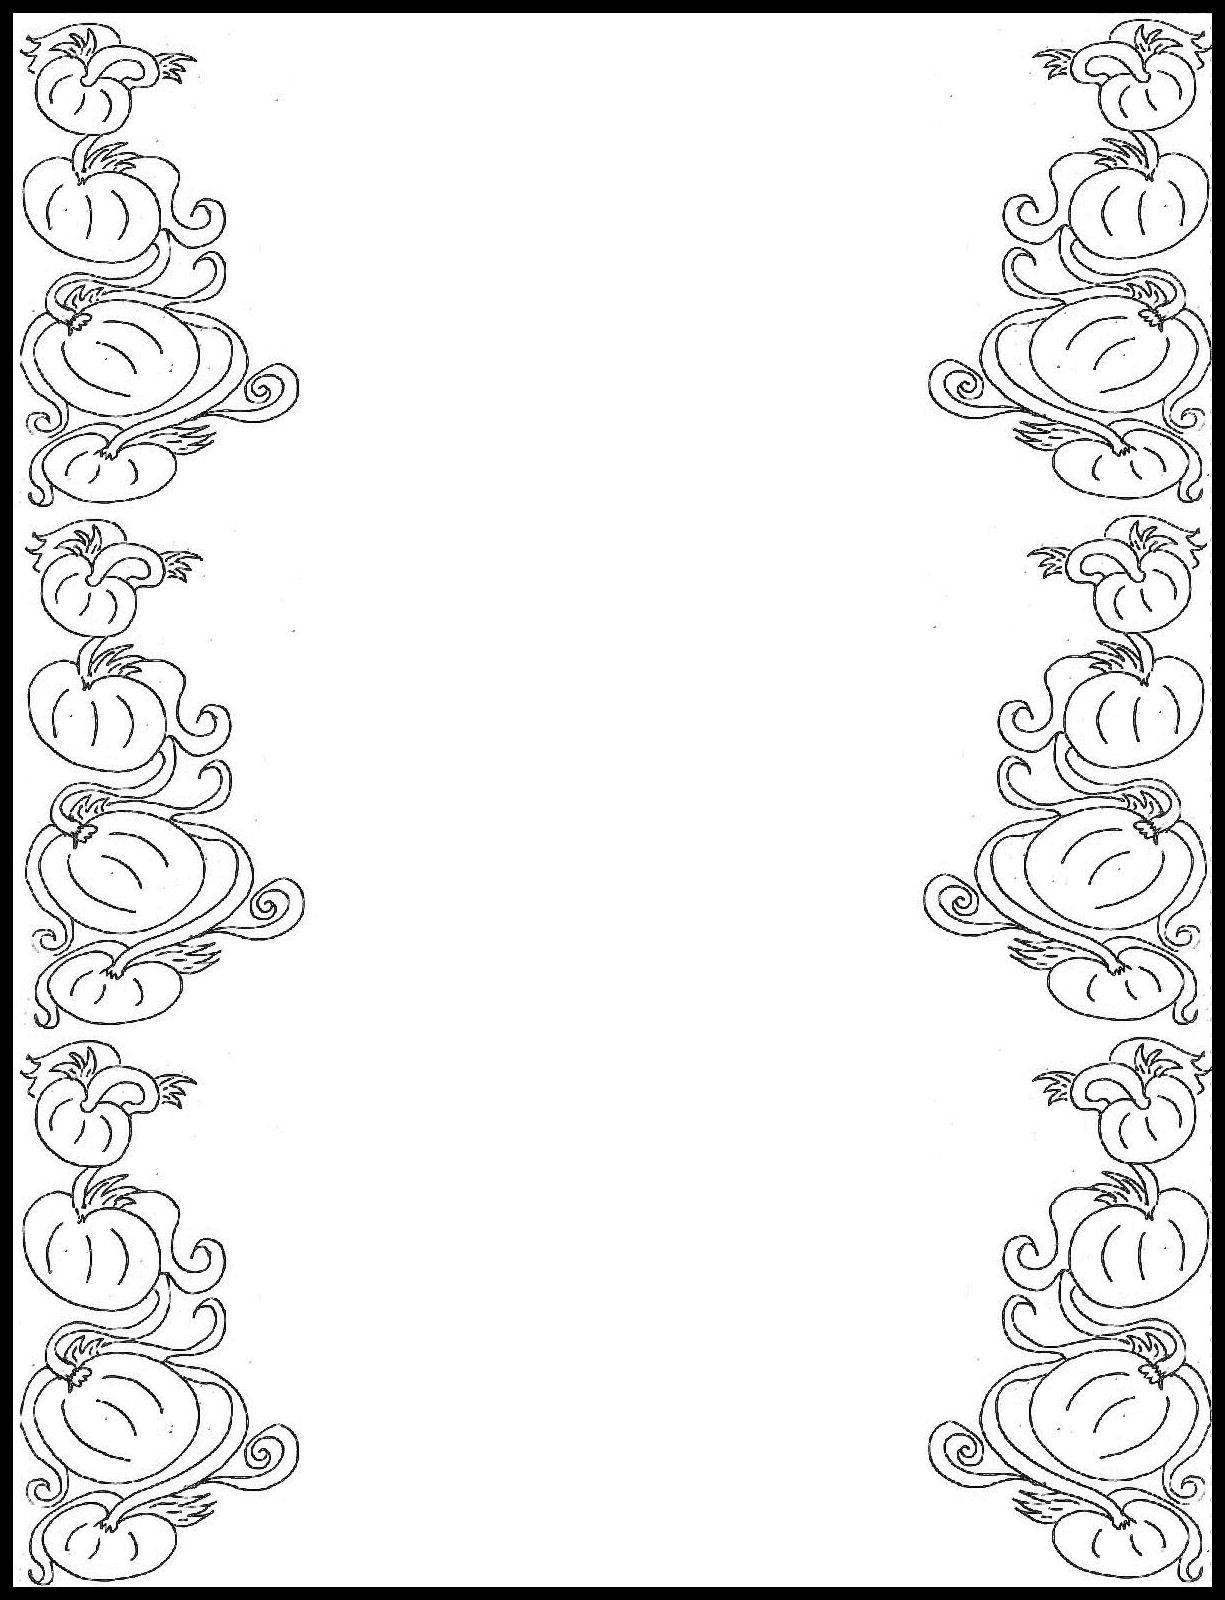 Free Printable Paper Border Designs Christian - ClipArt Best ...